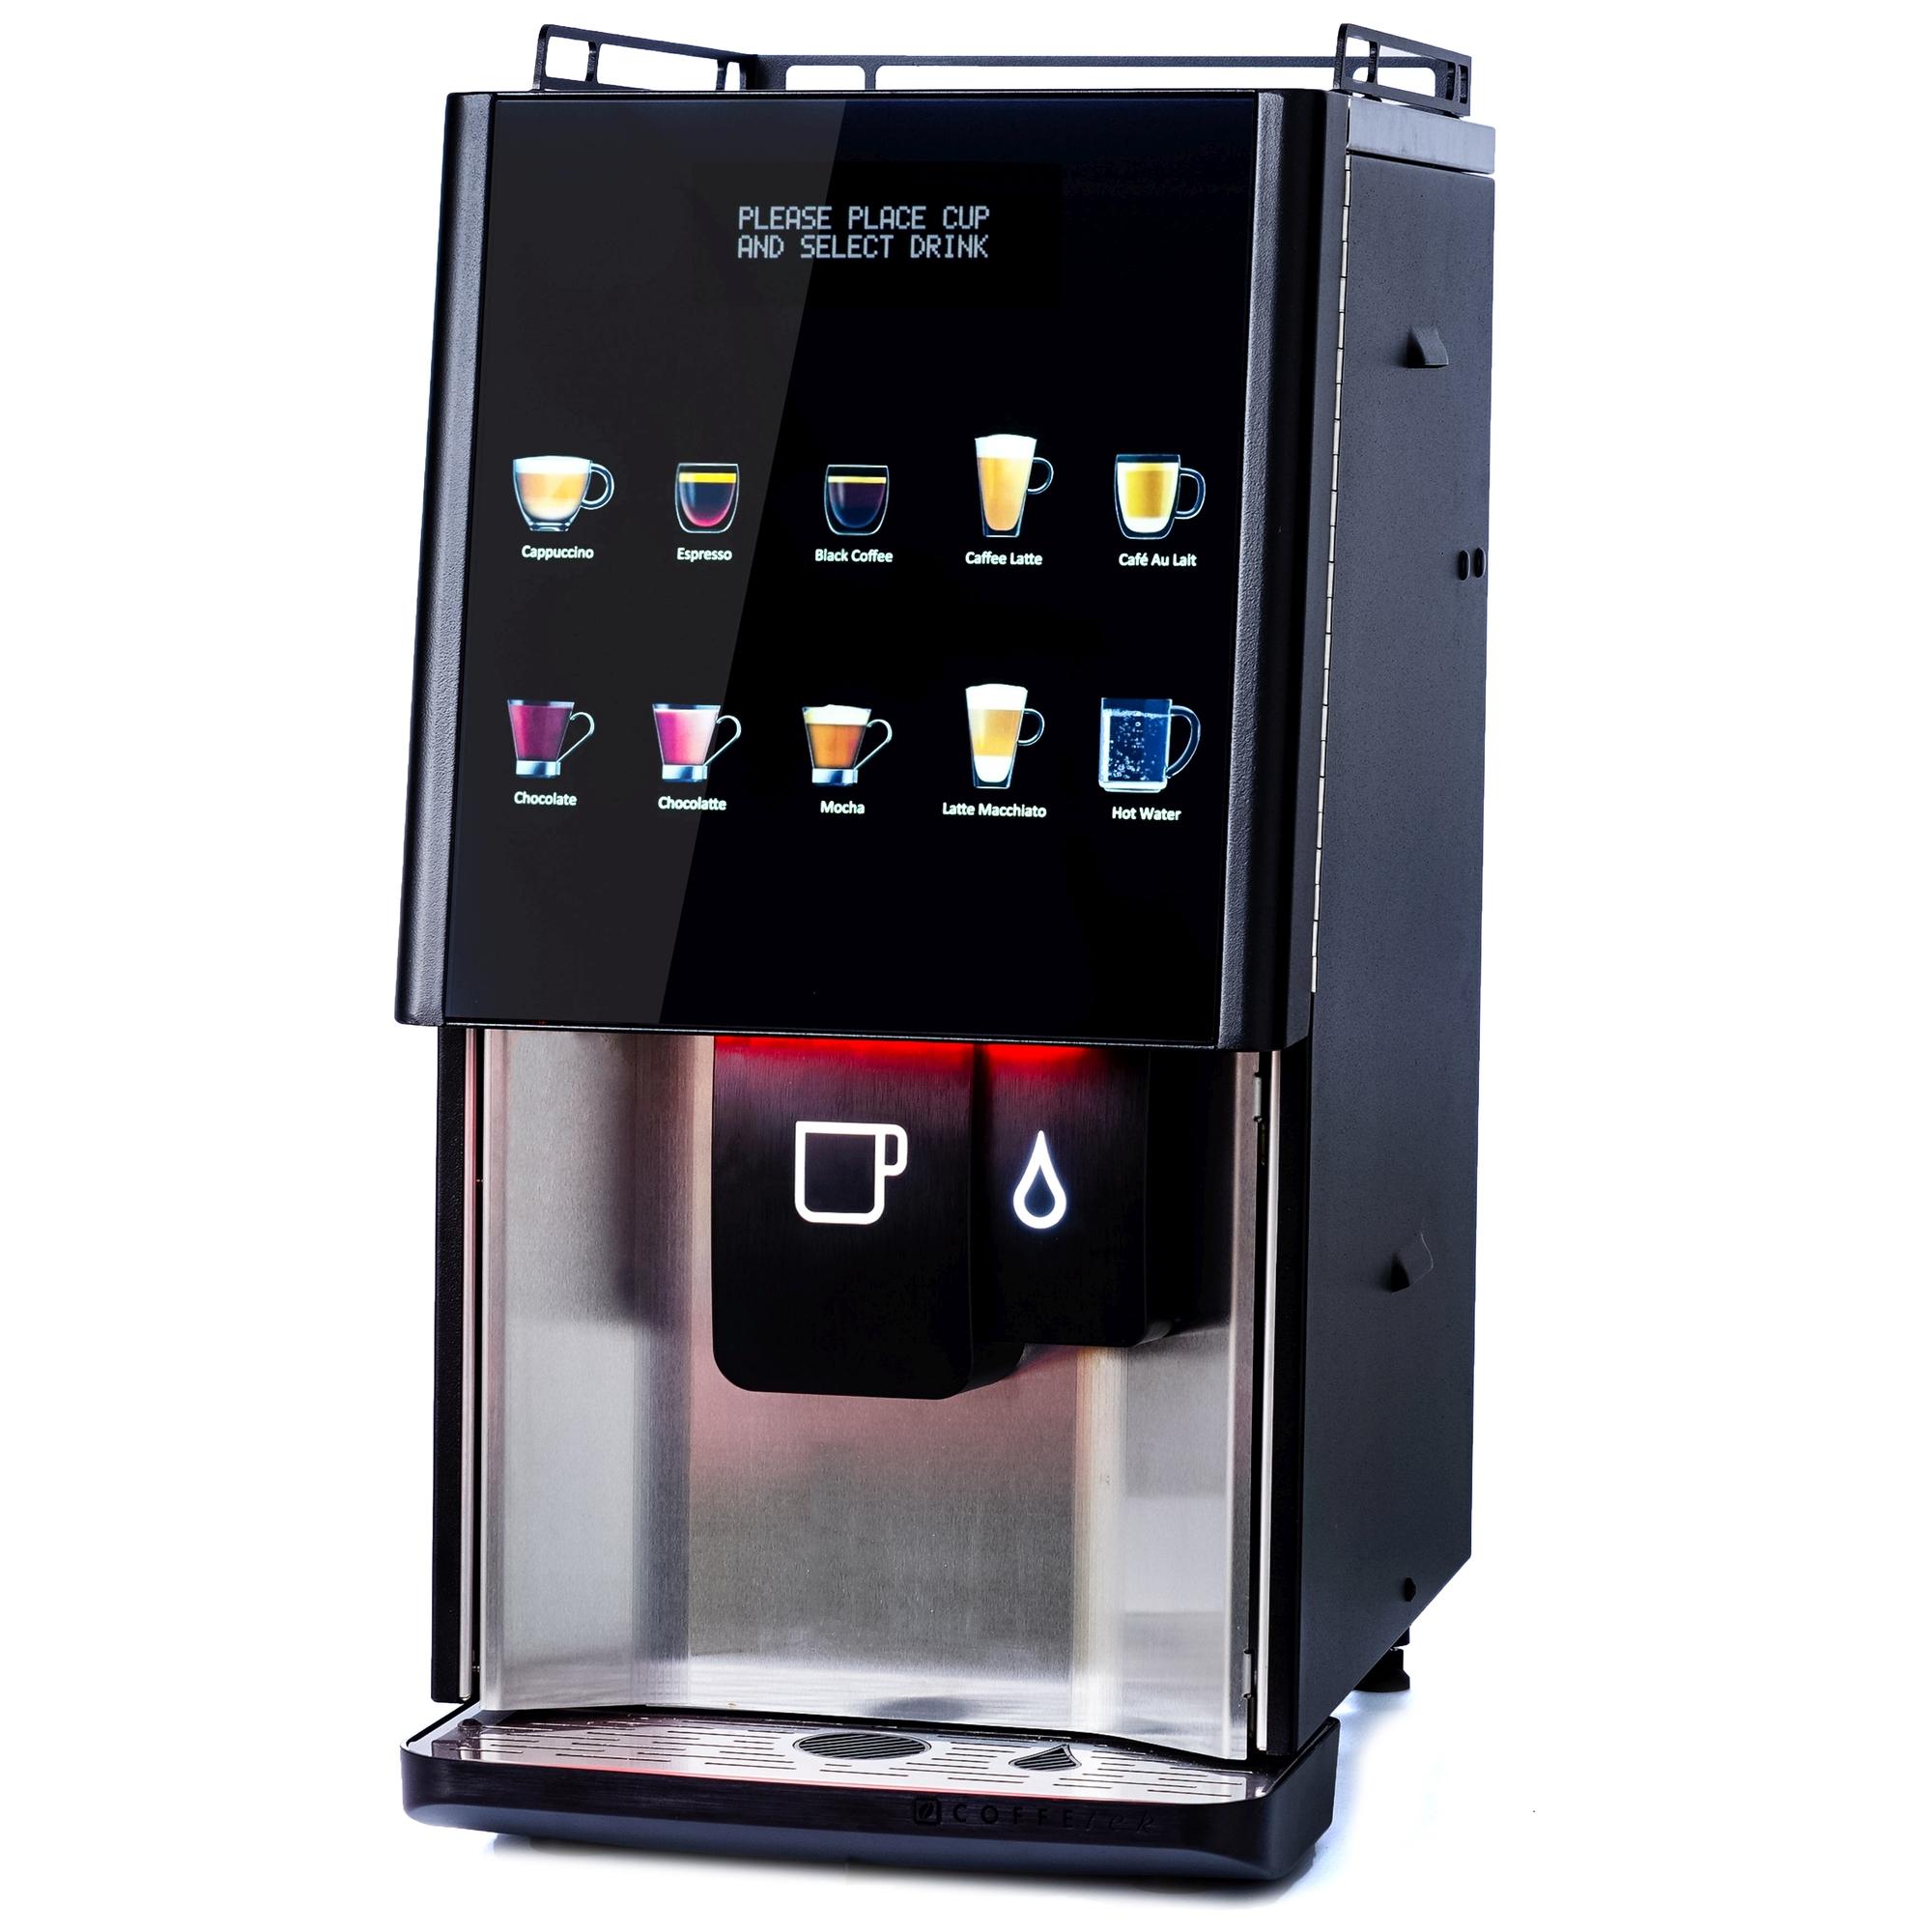 Vitro S2 Coffee Machine